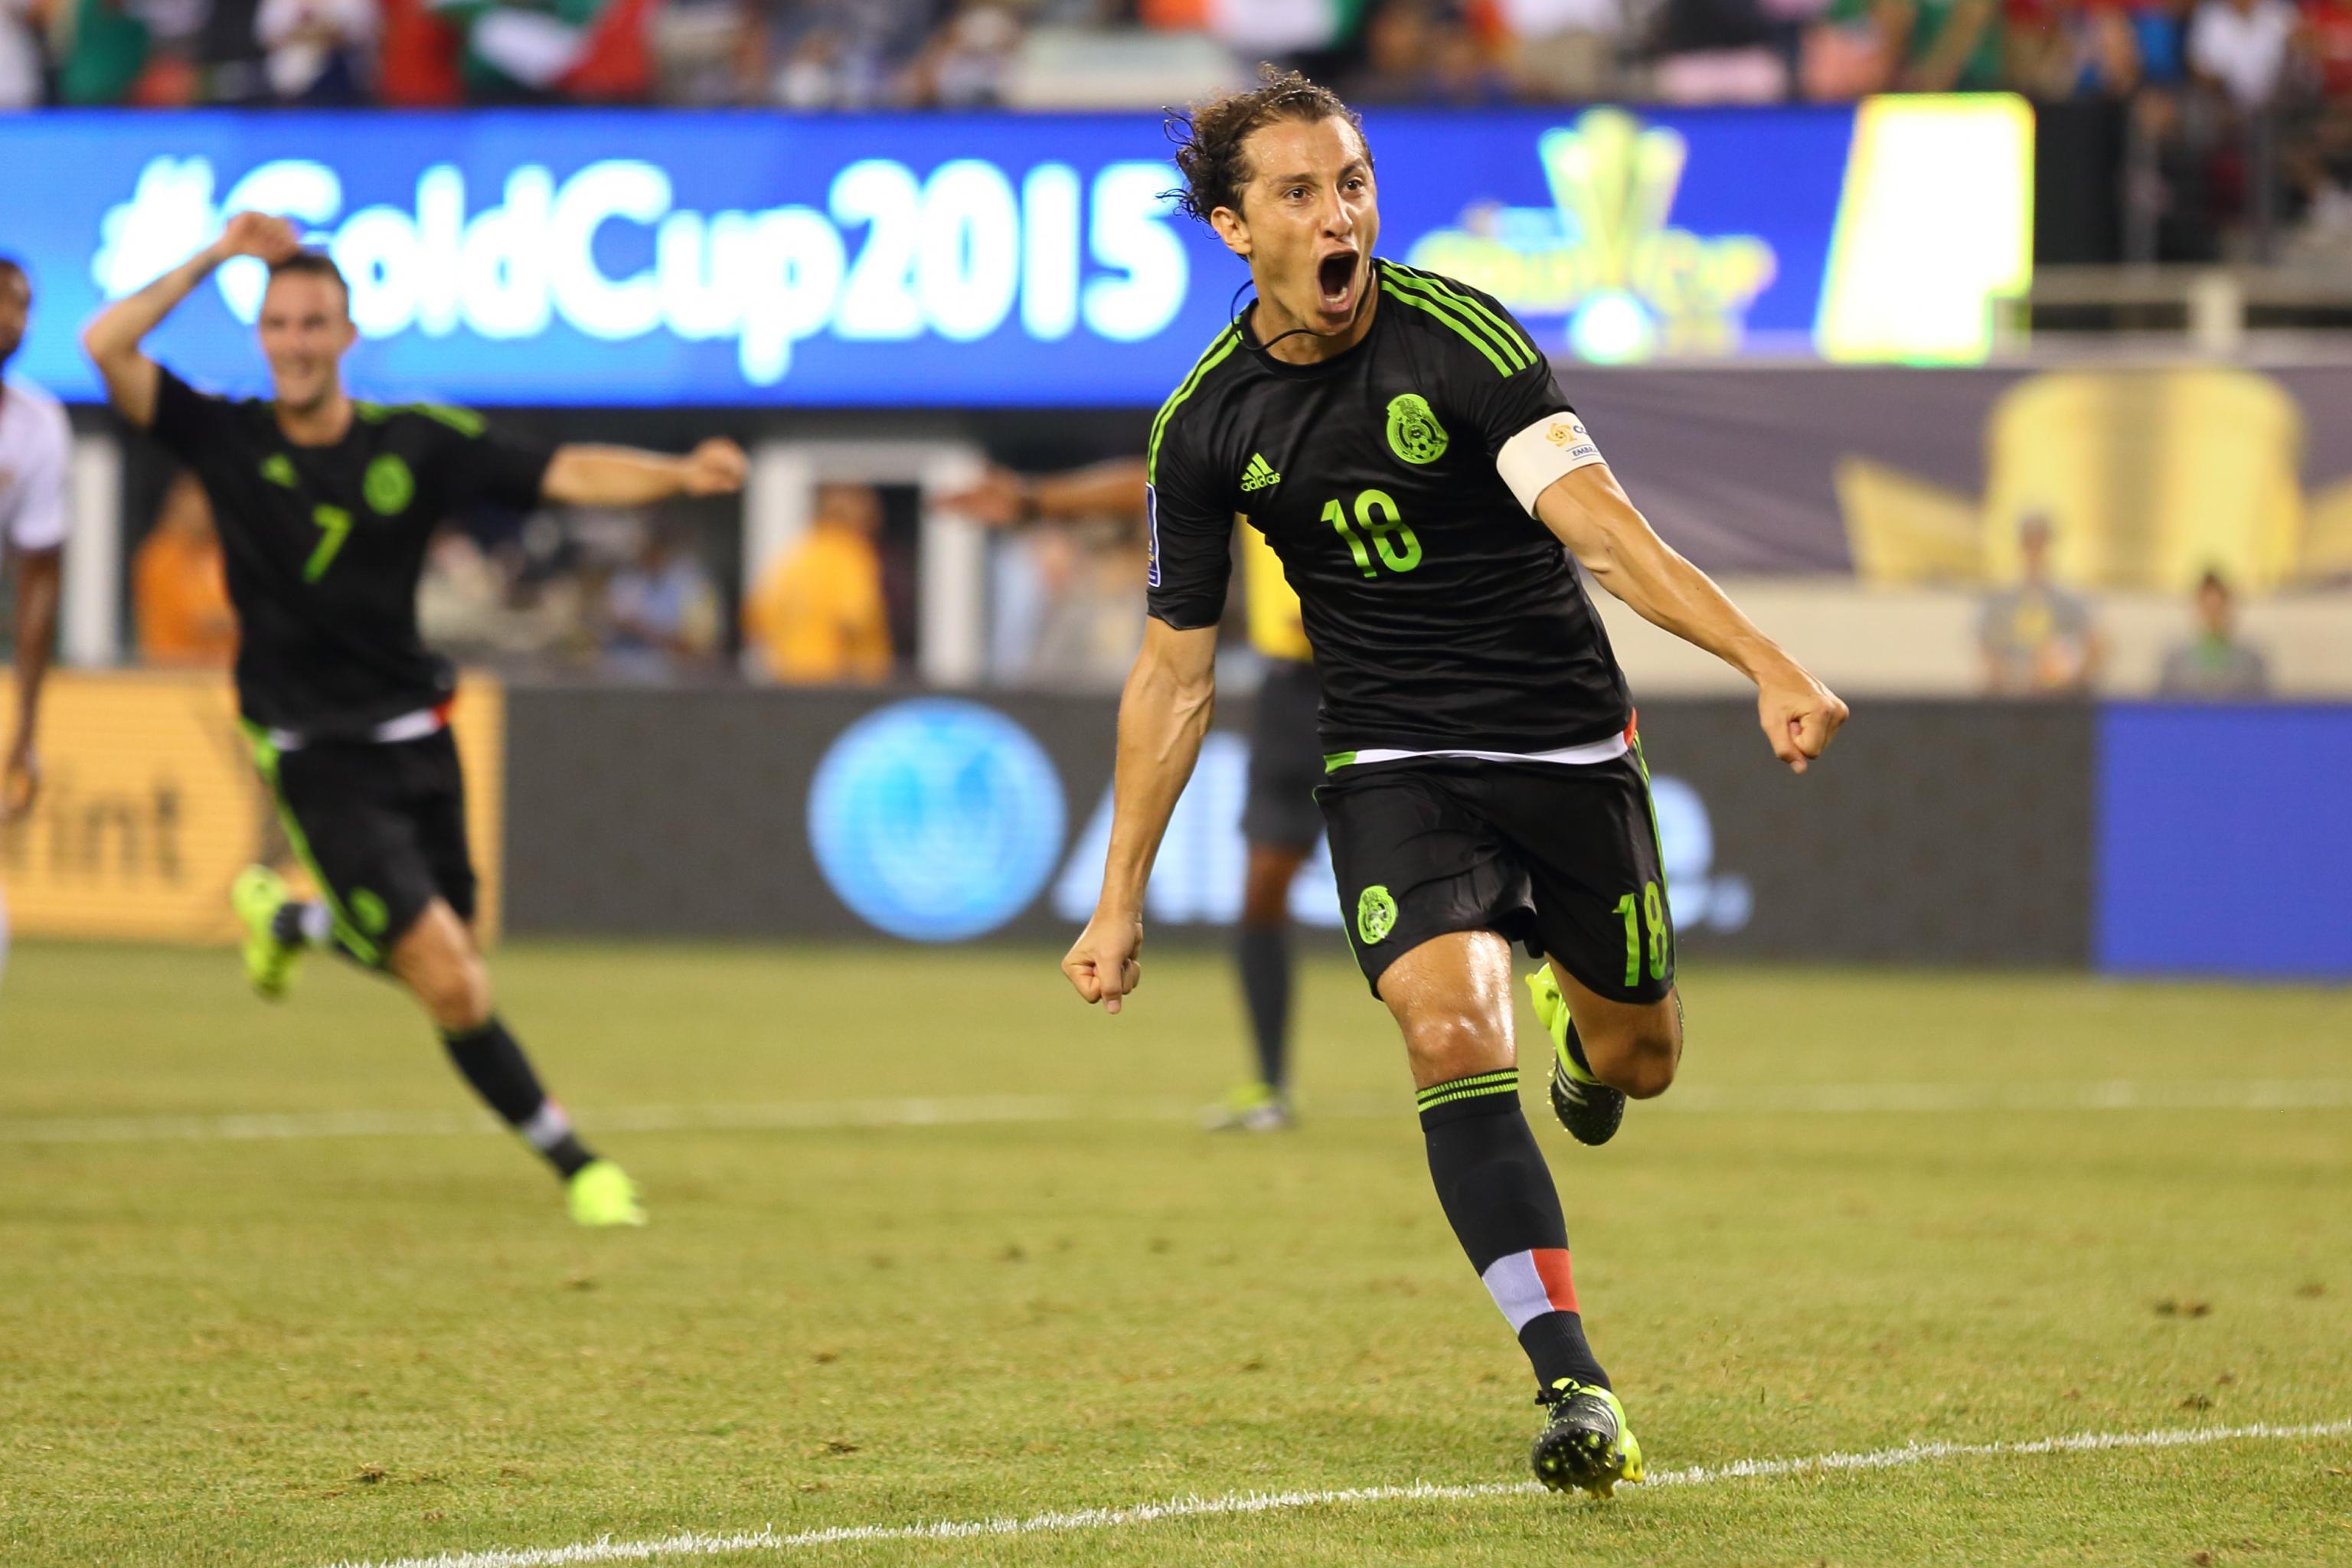 Andres Guardado Video Porno andres guardado shining for mexico in captain's role at gold